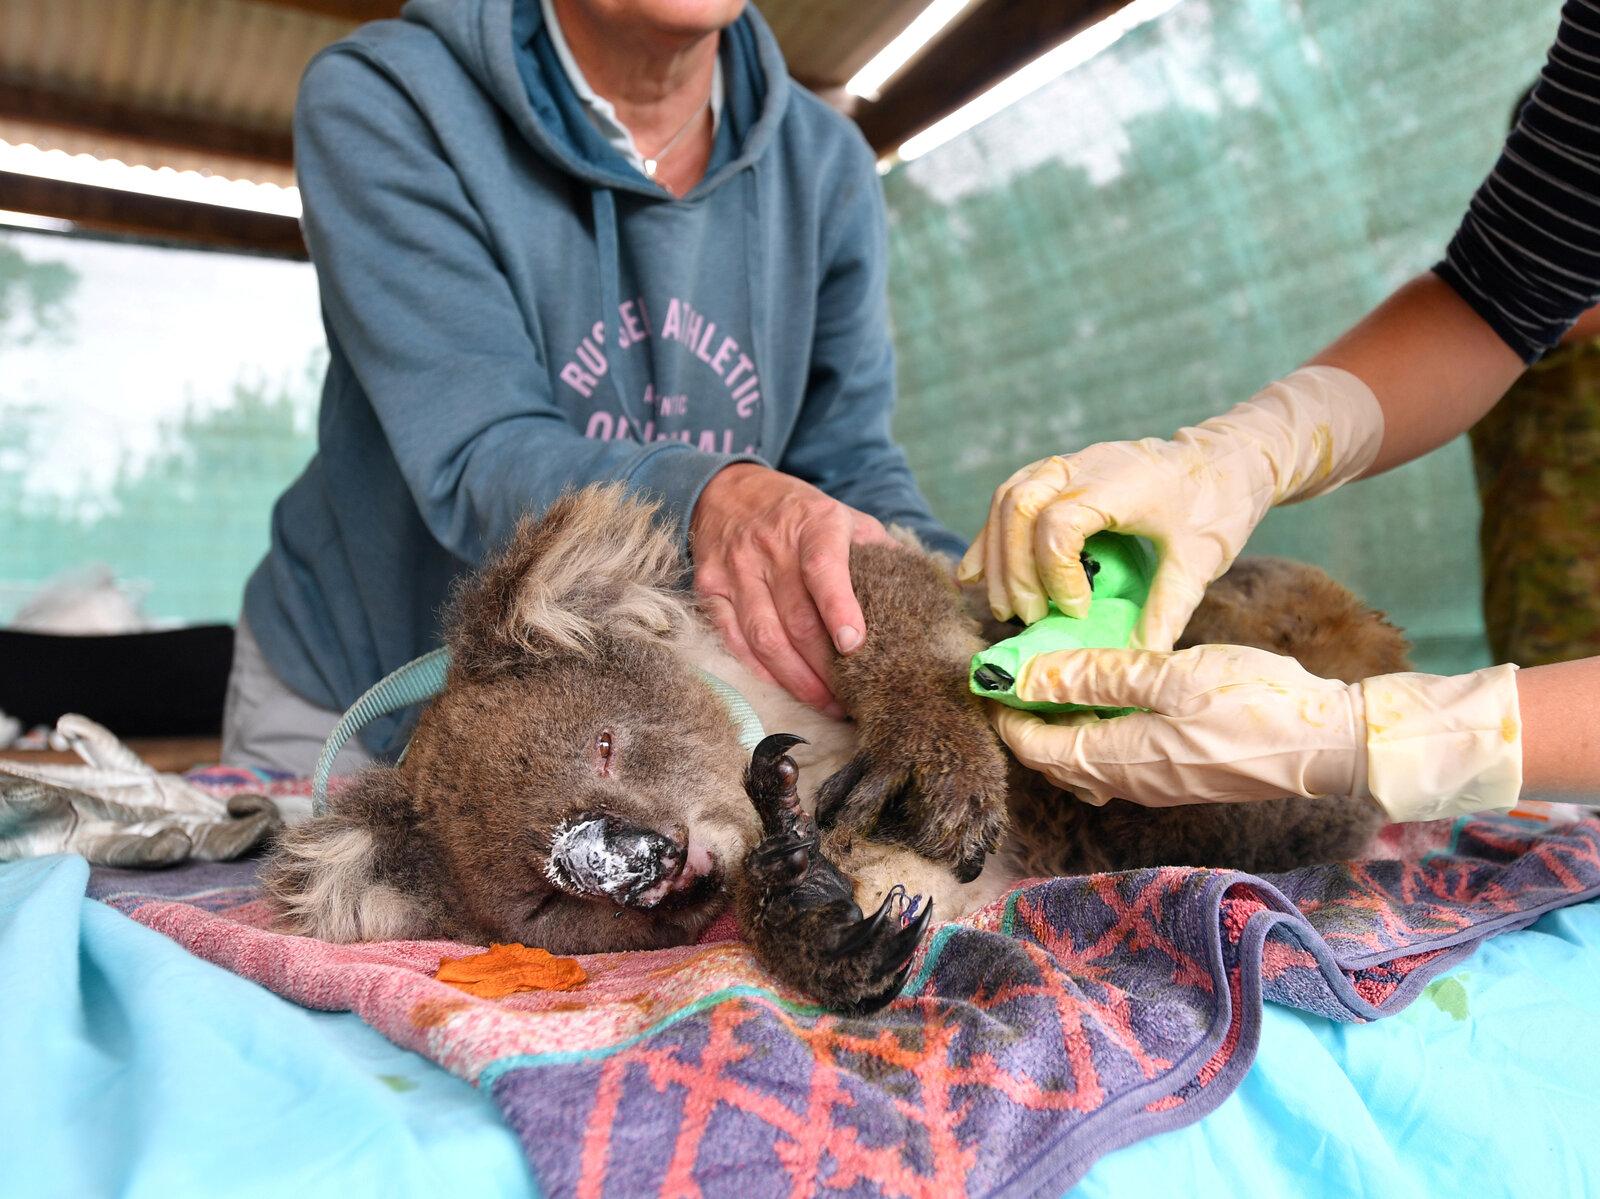 Veterinarians and volunteers treat koalas at Kangaroo Island Wildlife Park on Kangaroo Island, southwest of Adelaide, Australia, on Friday. We are planting trees in Australia.ShoptheKei.com